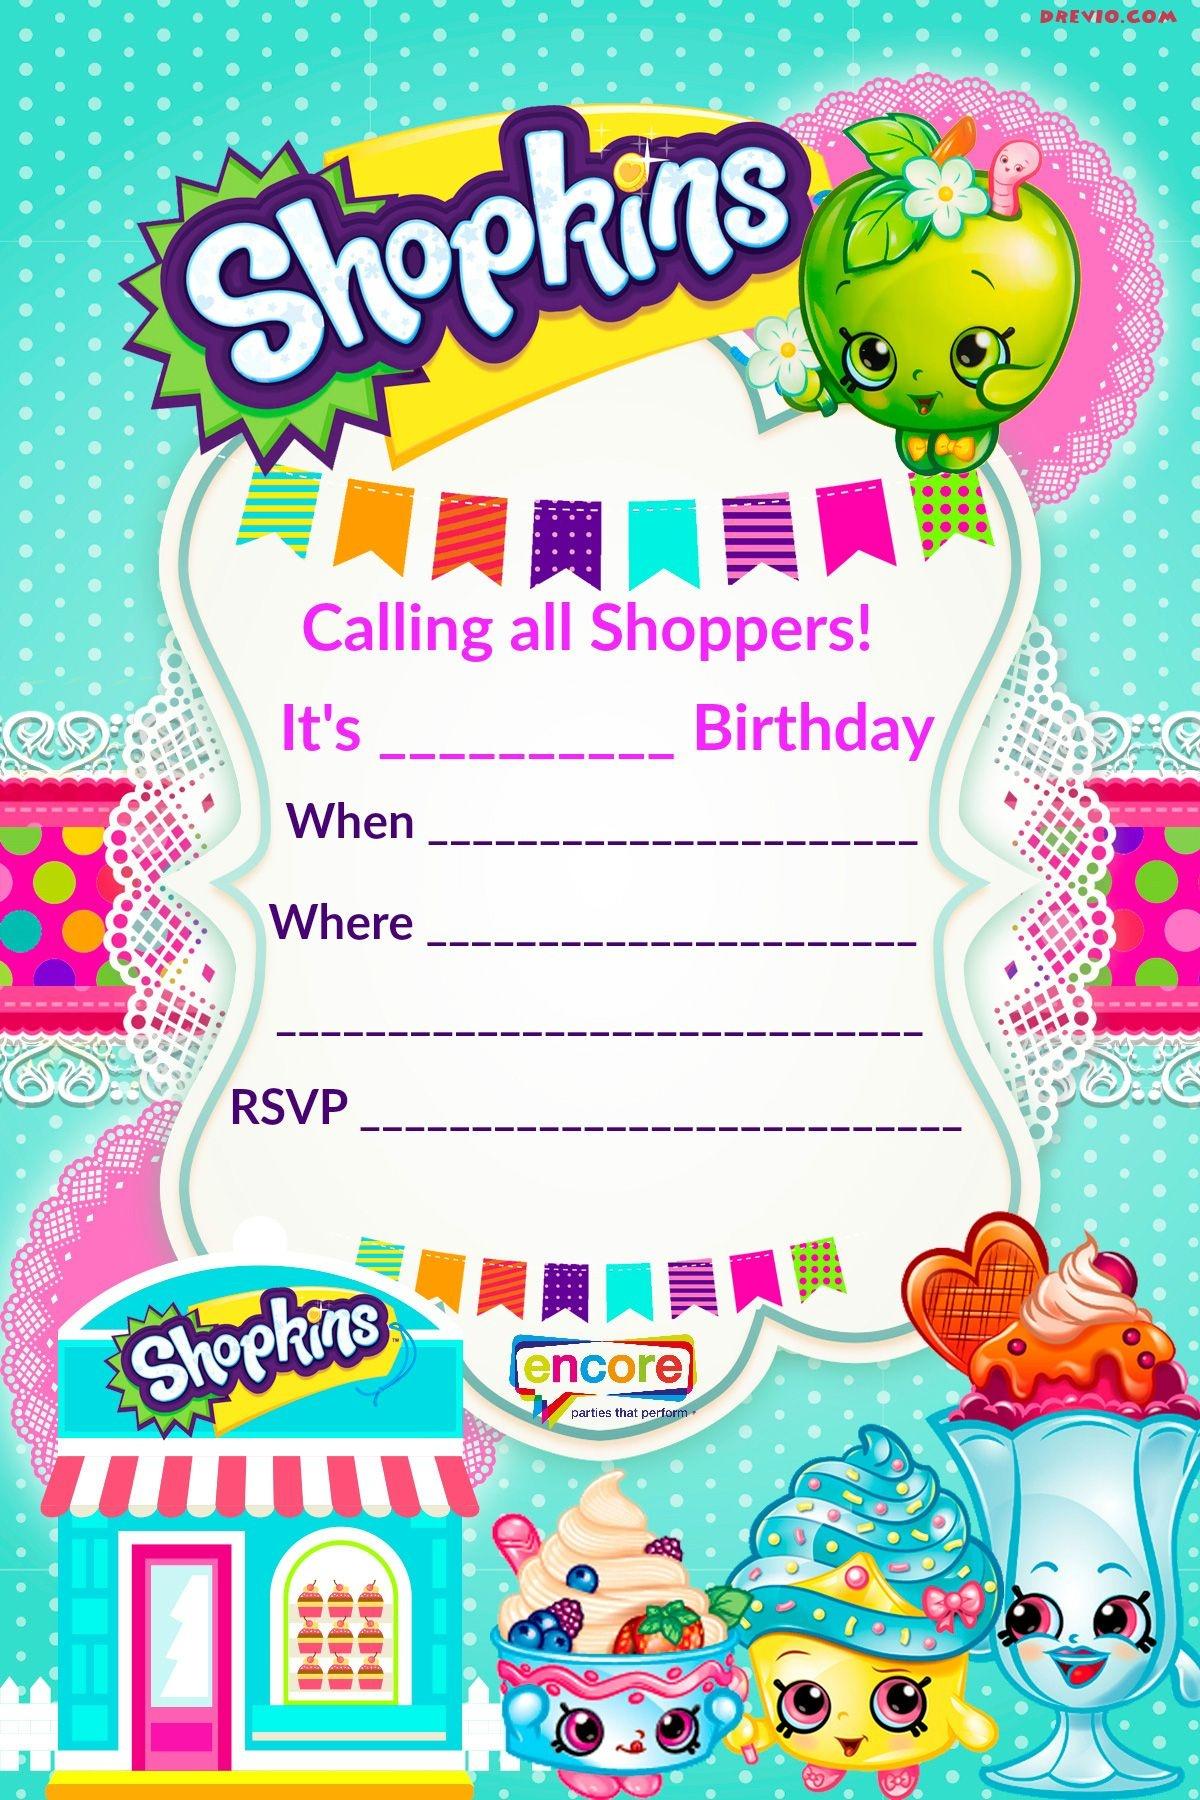 Updated - Free Printable Shopkins Birthday Invitation | Free - Printable Invitations Free No Download